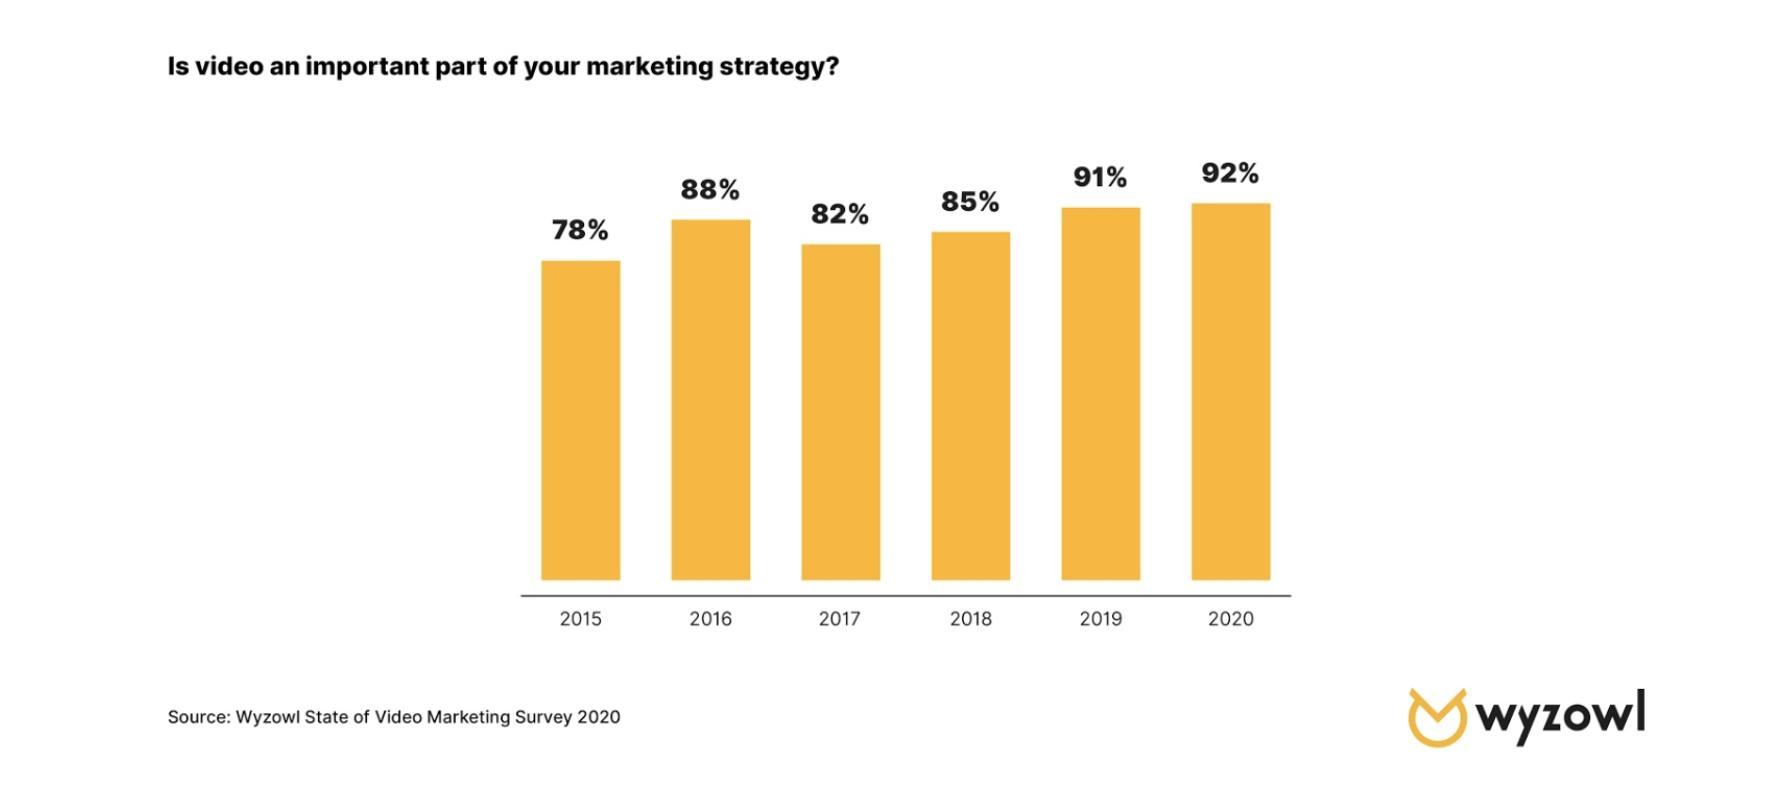 Video Marketing Increasing in 2020